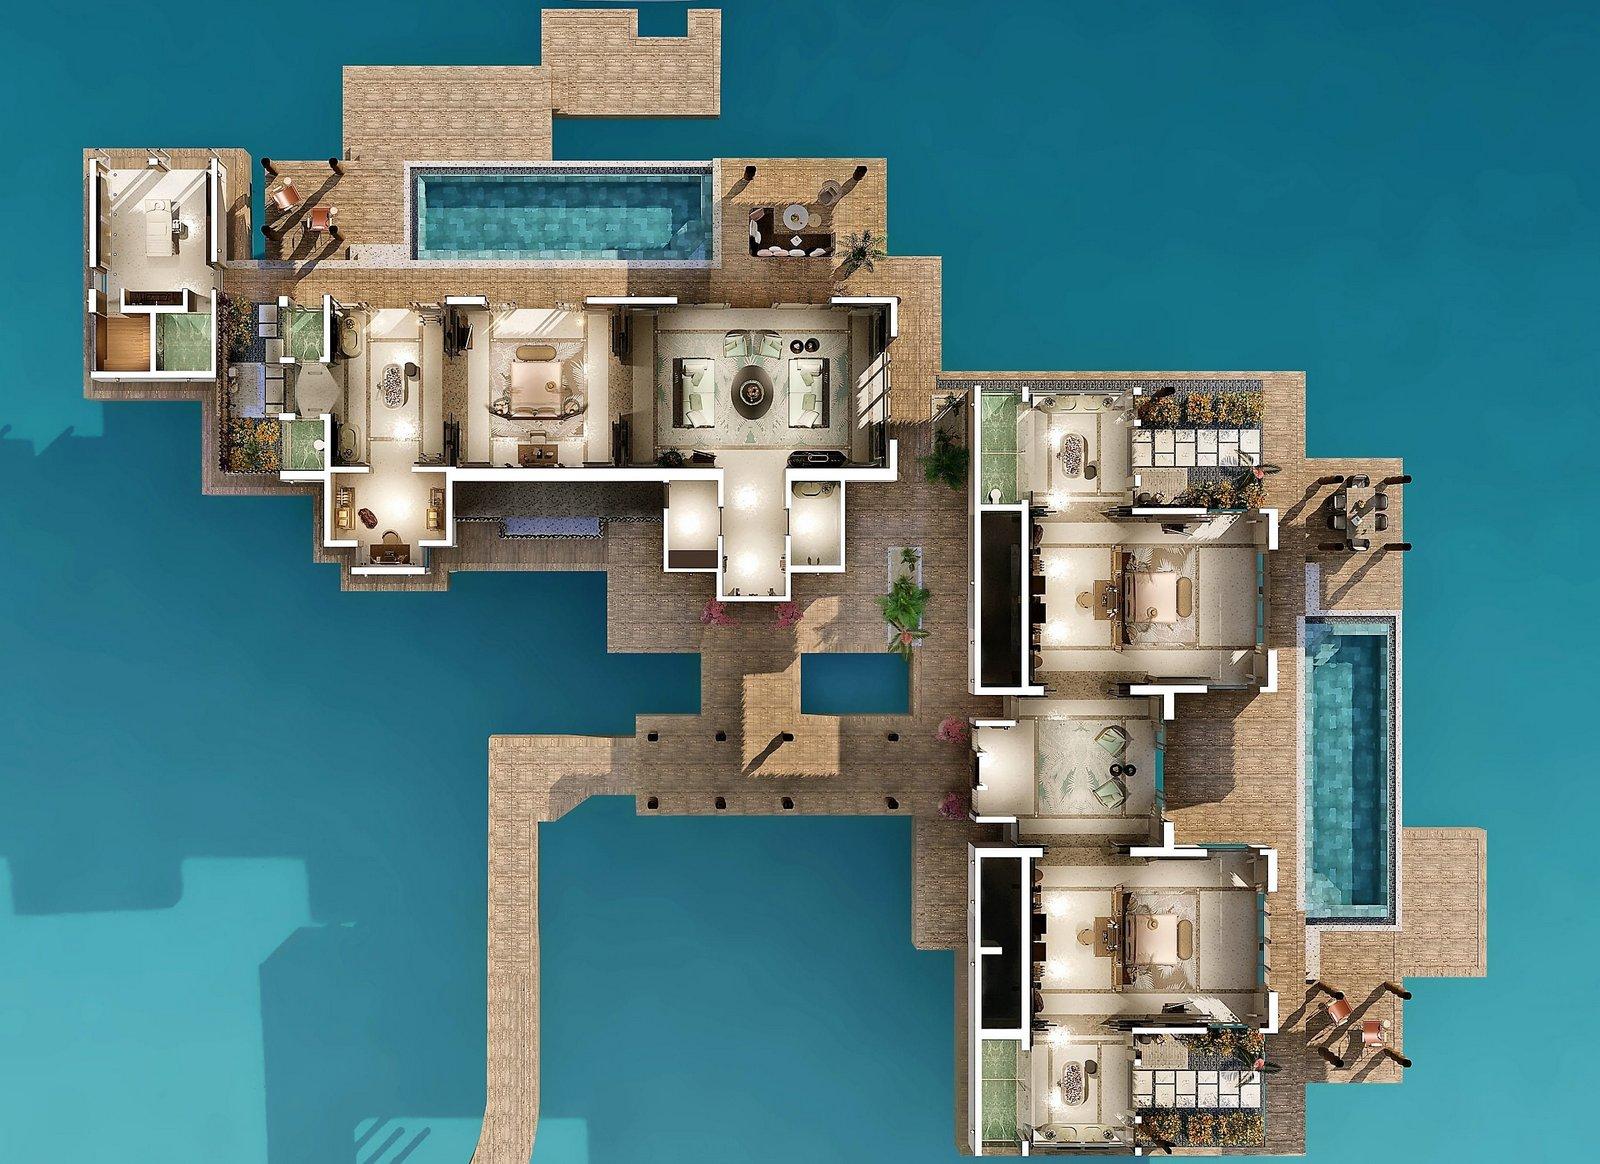 Мальдивы, отель Joali Maldives, план-схема номера Three Bed Room Ocean Residence with Two Pool